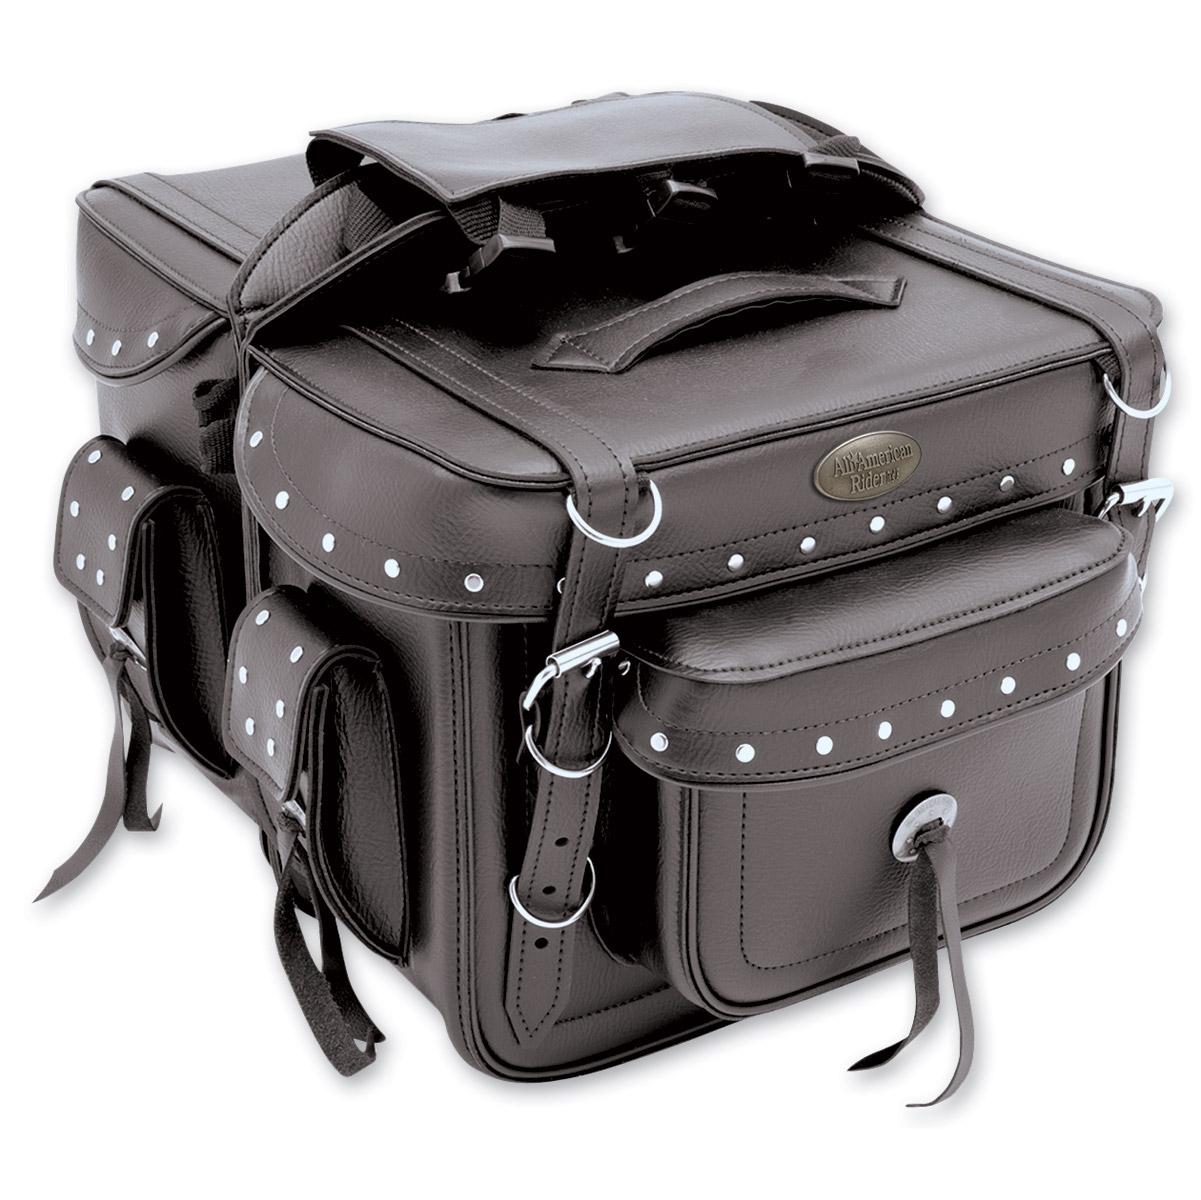 All American Rider Detachable Box-Style Saddlebags